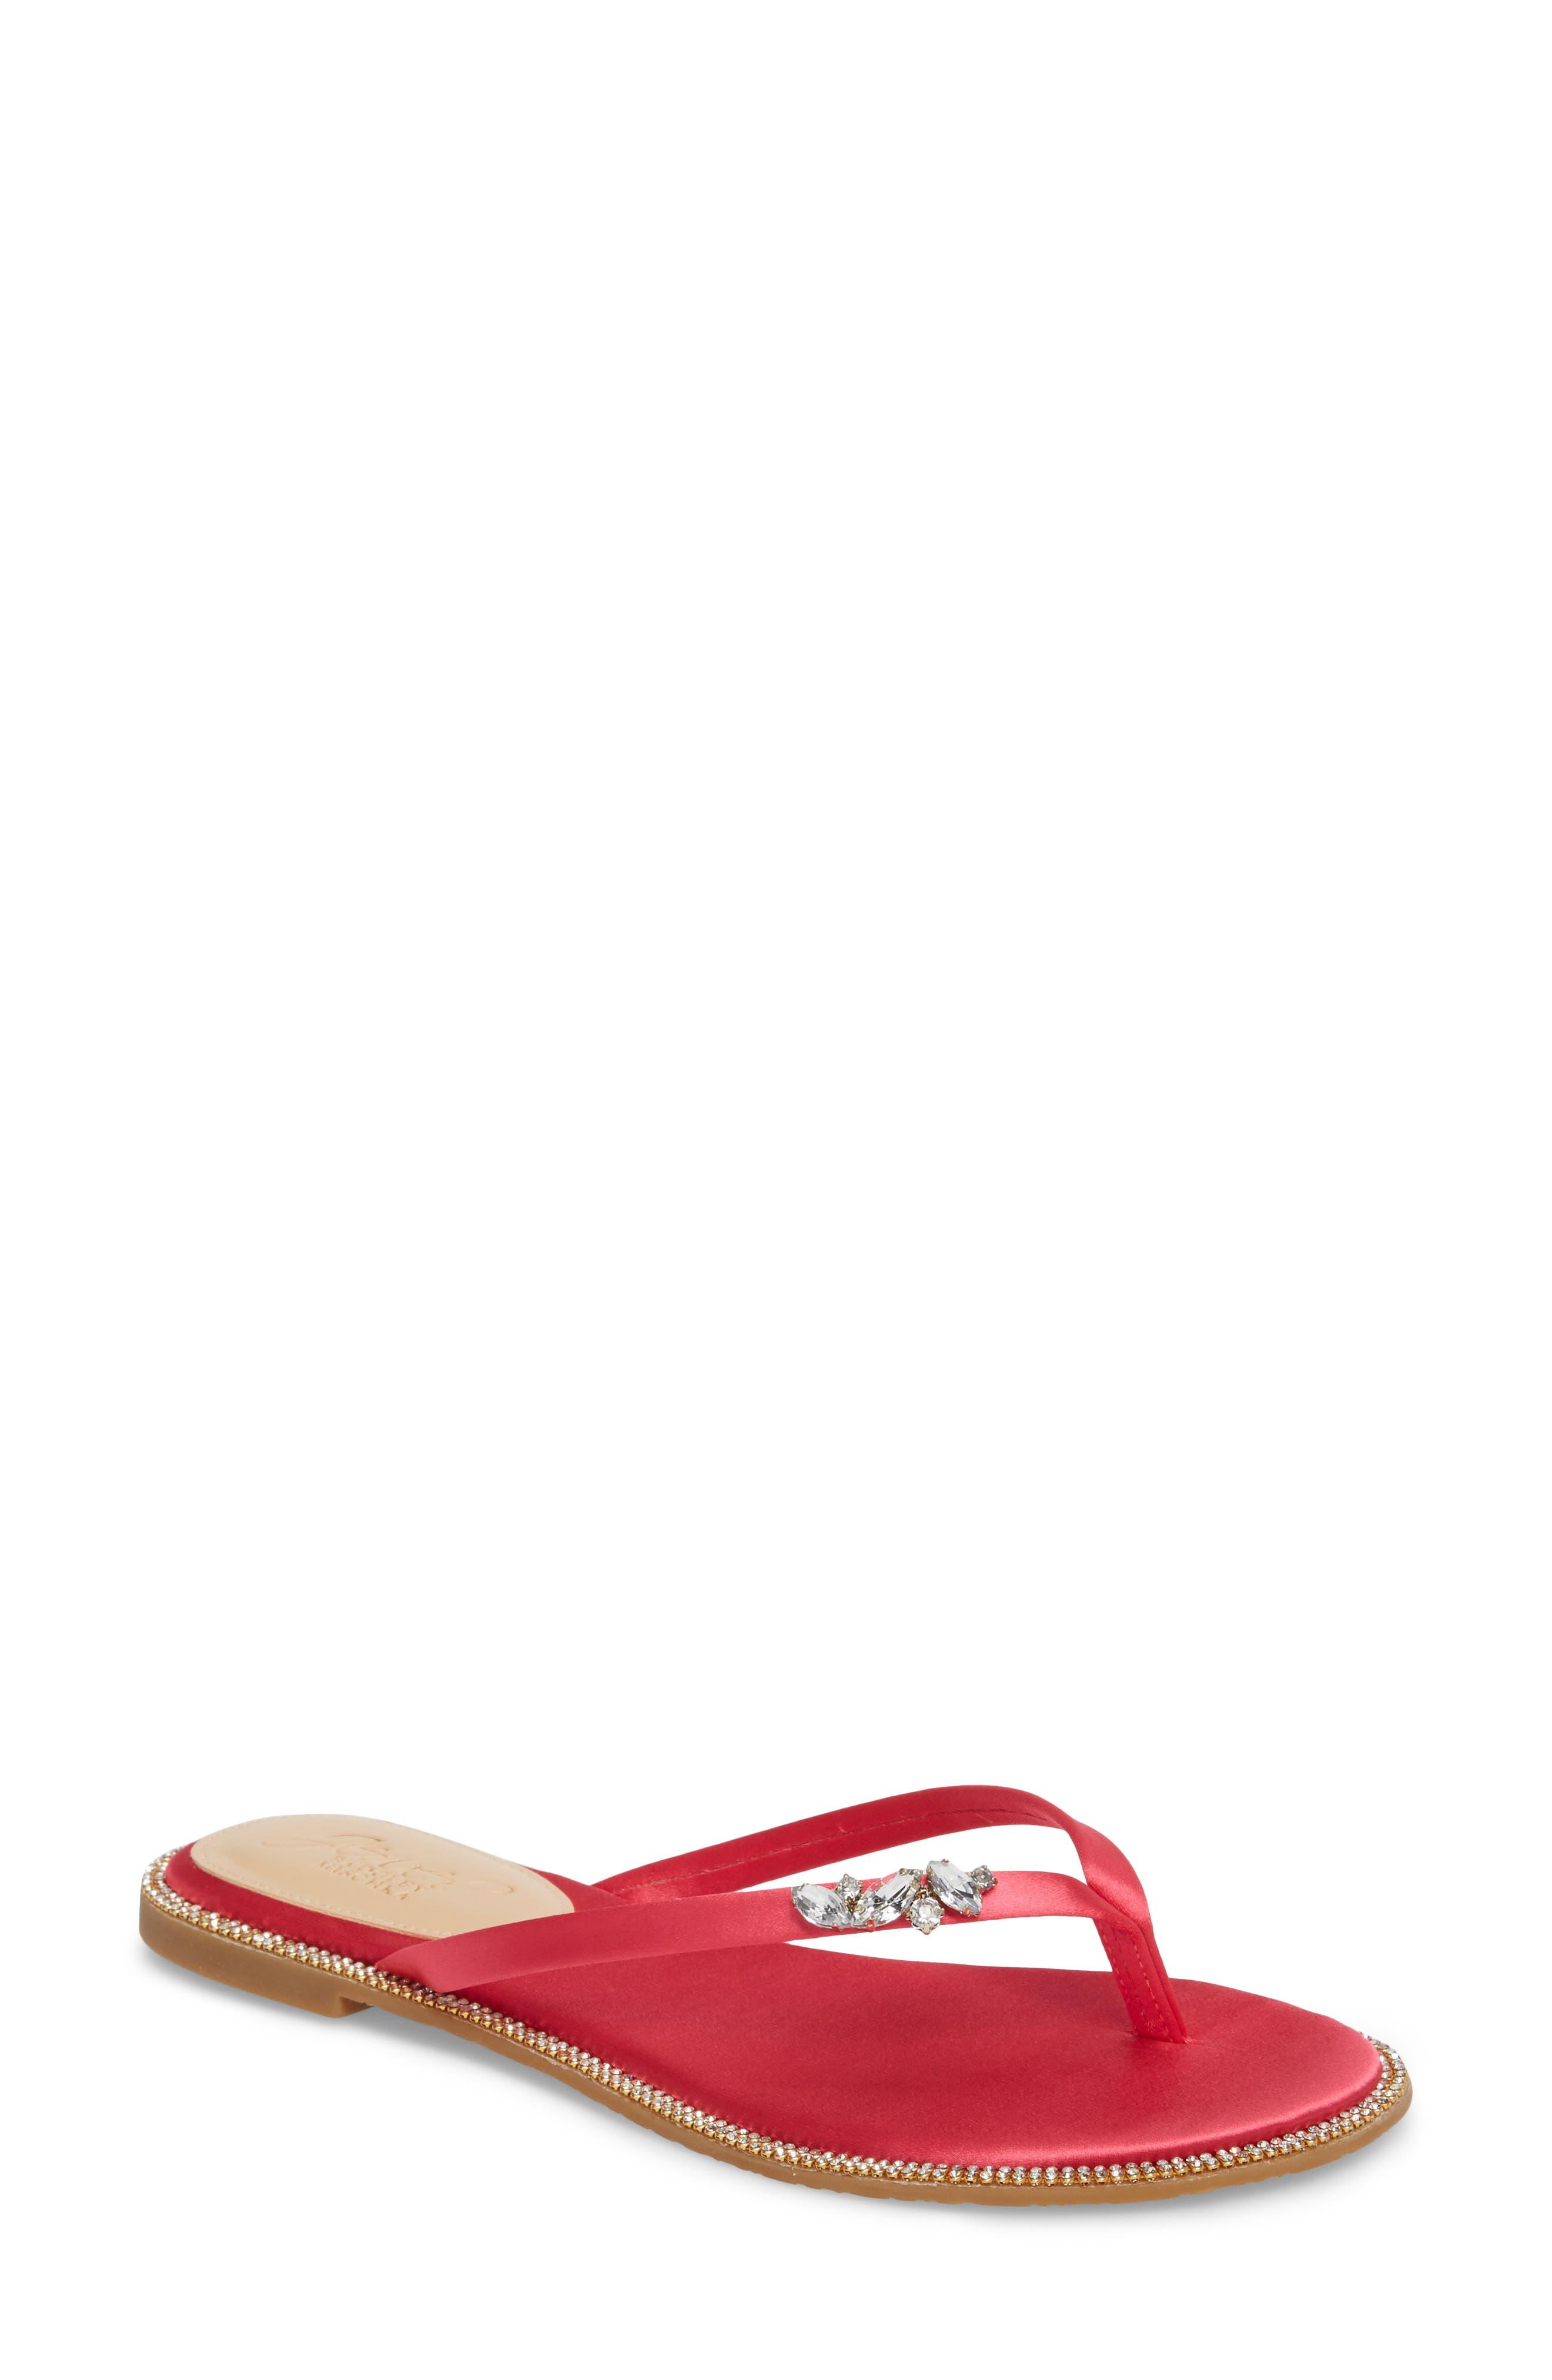 Thalia Crystal Embellished Flip Flop,                             Main thumbnail 1, color,                             Pink Leather